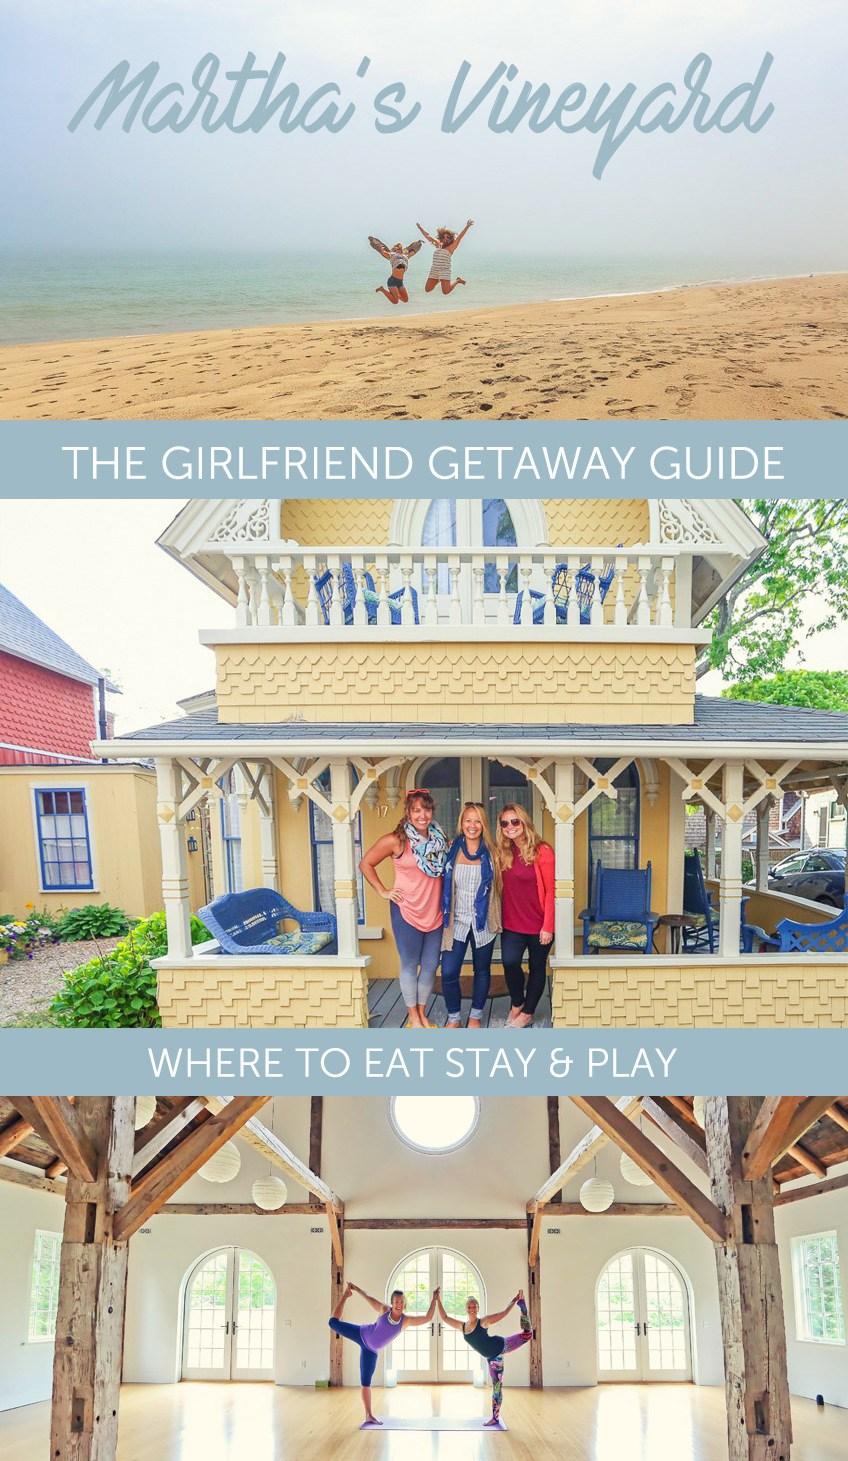 The Martha's Vineyard Girlfriend Getaway Guide